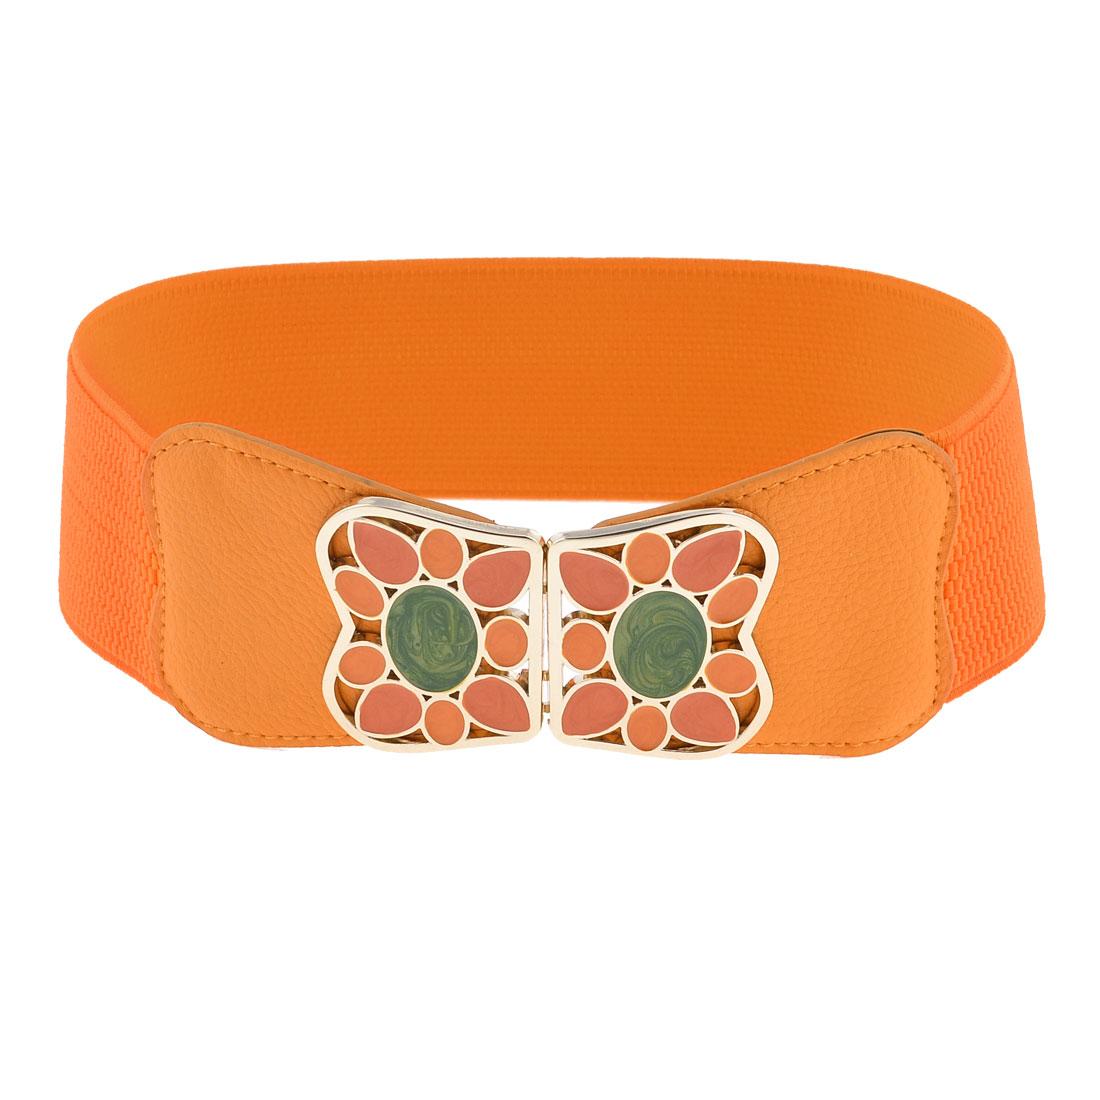 Colored Painted Metel Interlocking Buckle 6cm Width Elastic Waistband Orange